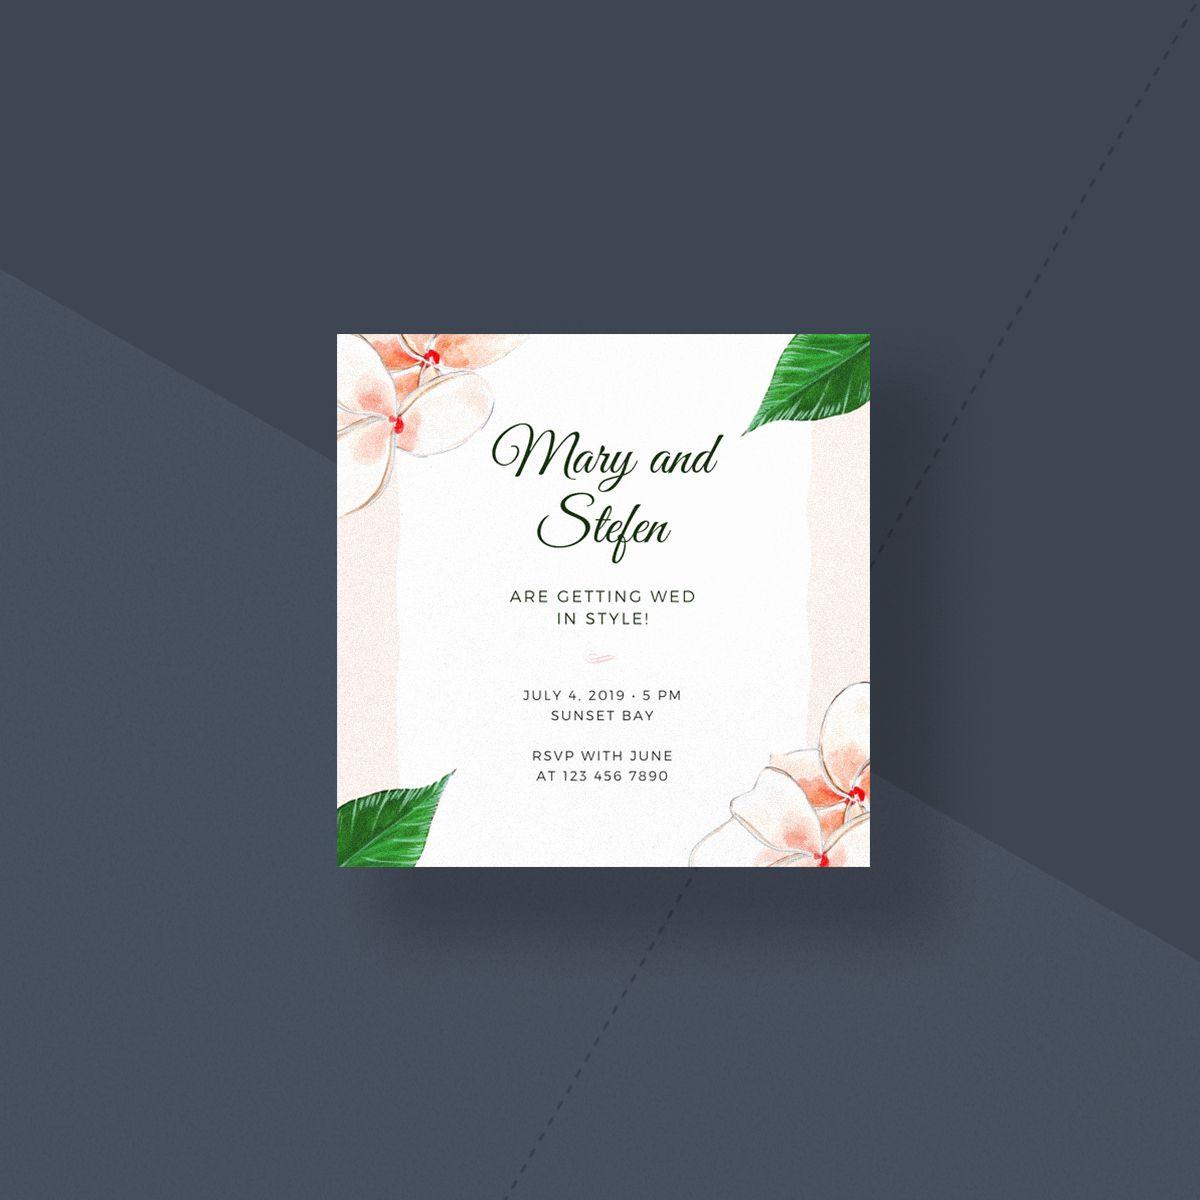 Wedding Rsvp Cards Templates Unique Wedding Invitation